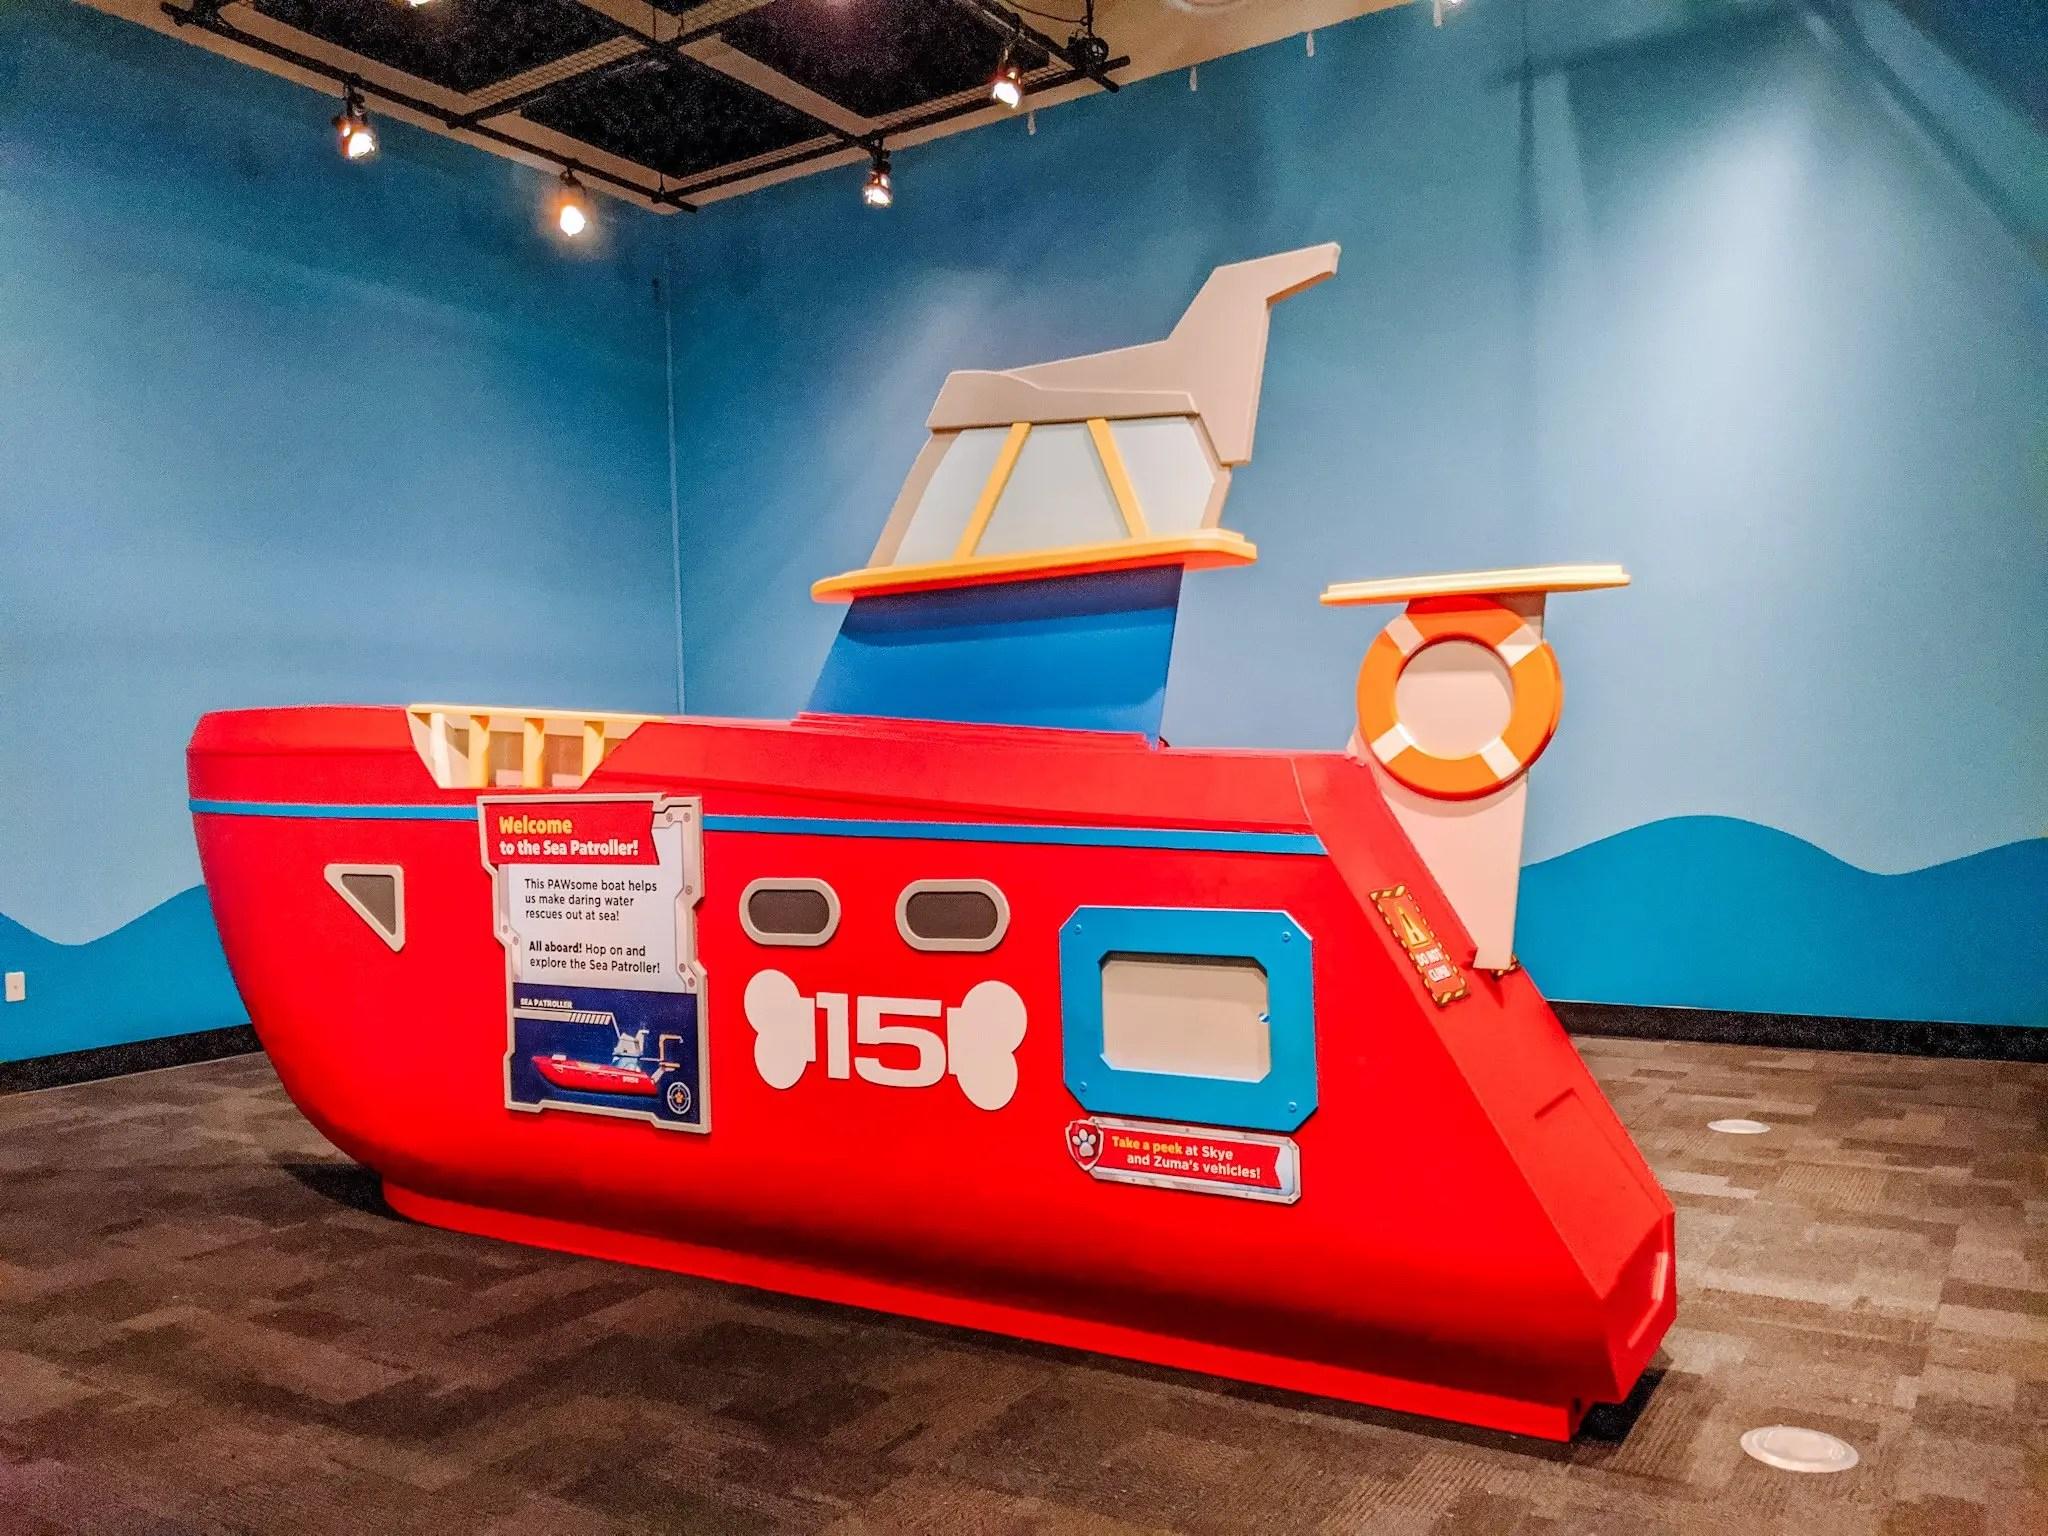 Paw Patrol exhibit at the Glazer Children's Museum